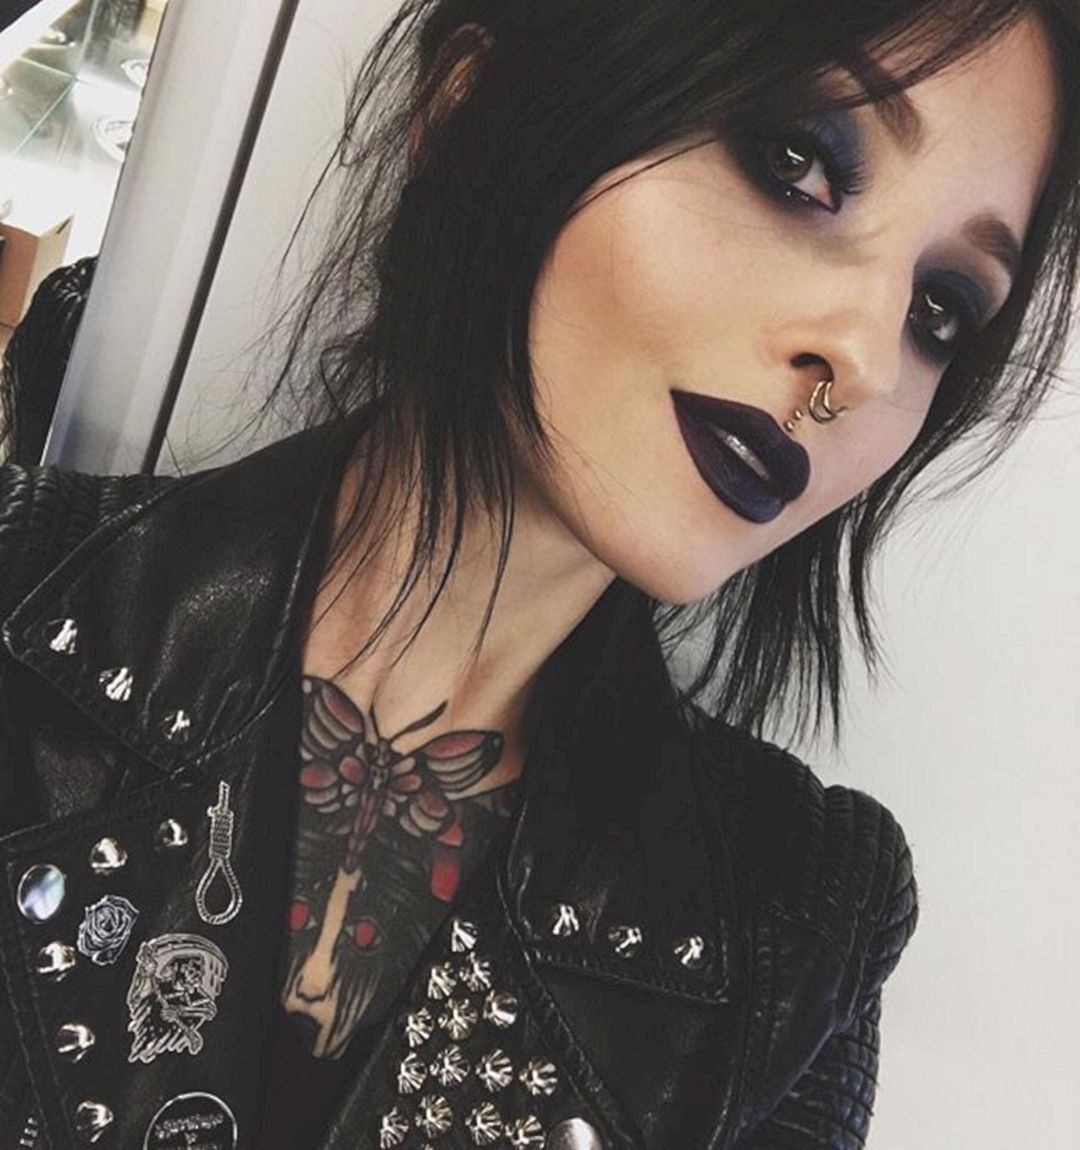 Amazing 50 Gorgeous Black Lipstick For Women Looks Cool Https Www Tukuoke Com 50 Gorgeous Black Lipstick For Women Loo Dark Makeup Punk Makeup Grunge Makeup